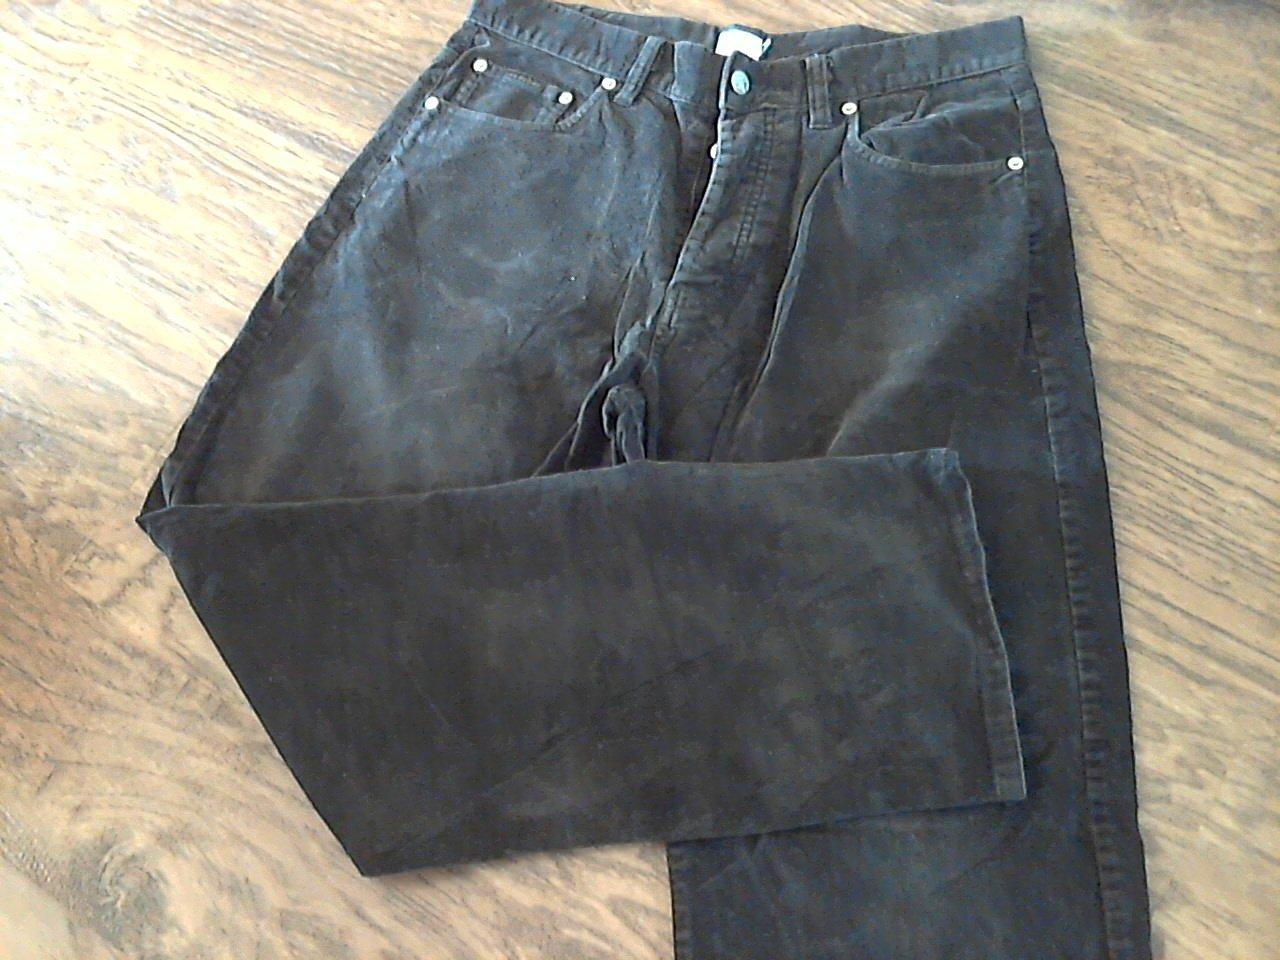 Calvin Klein Jeans man's black pant size 34